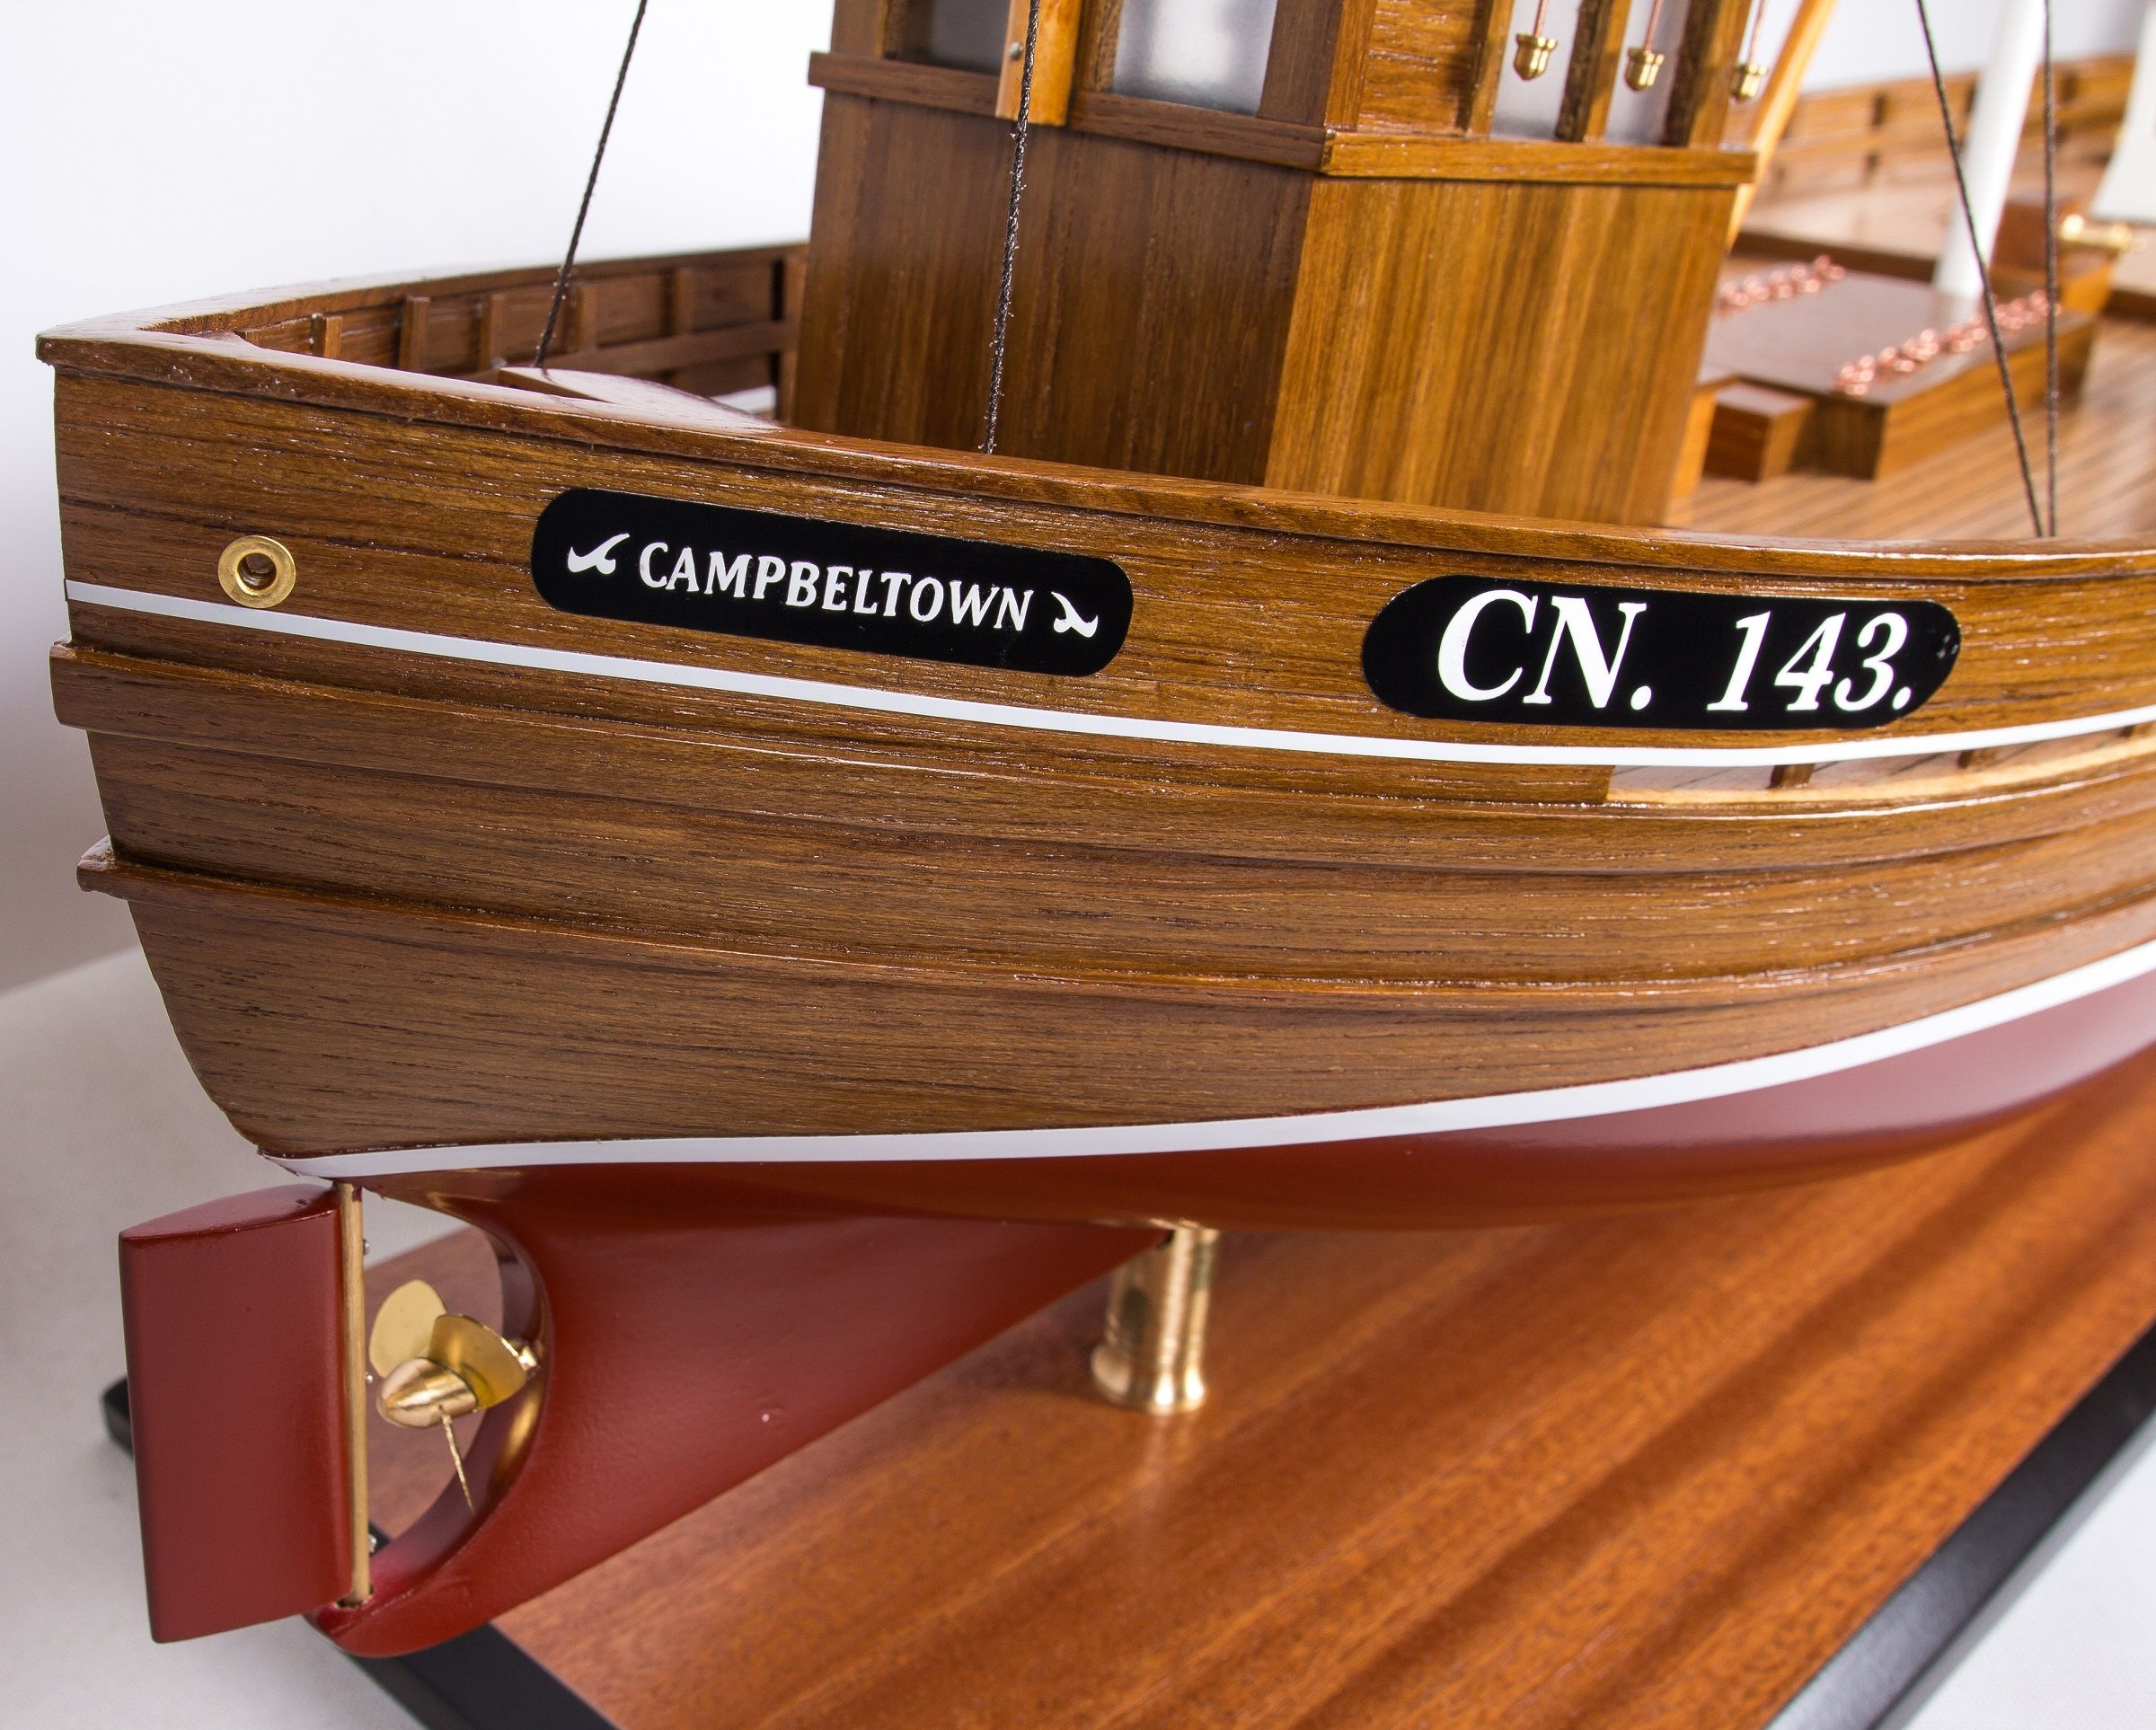 1666-9364-Amalthea-CN-143-Model-Boat